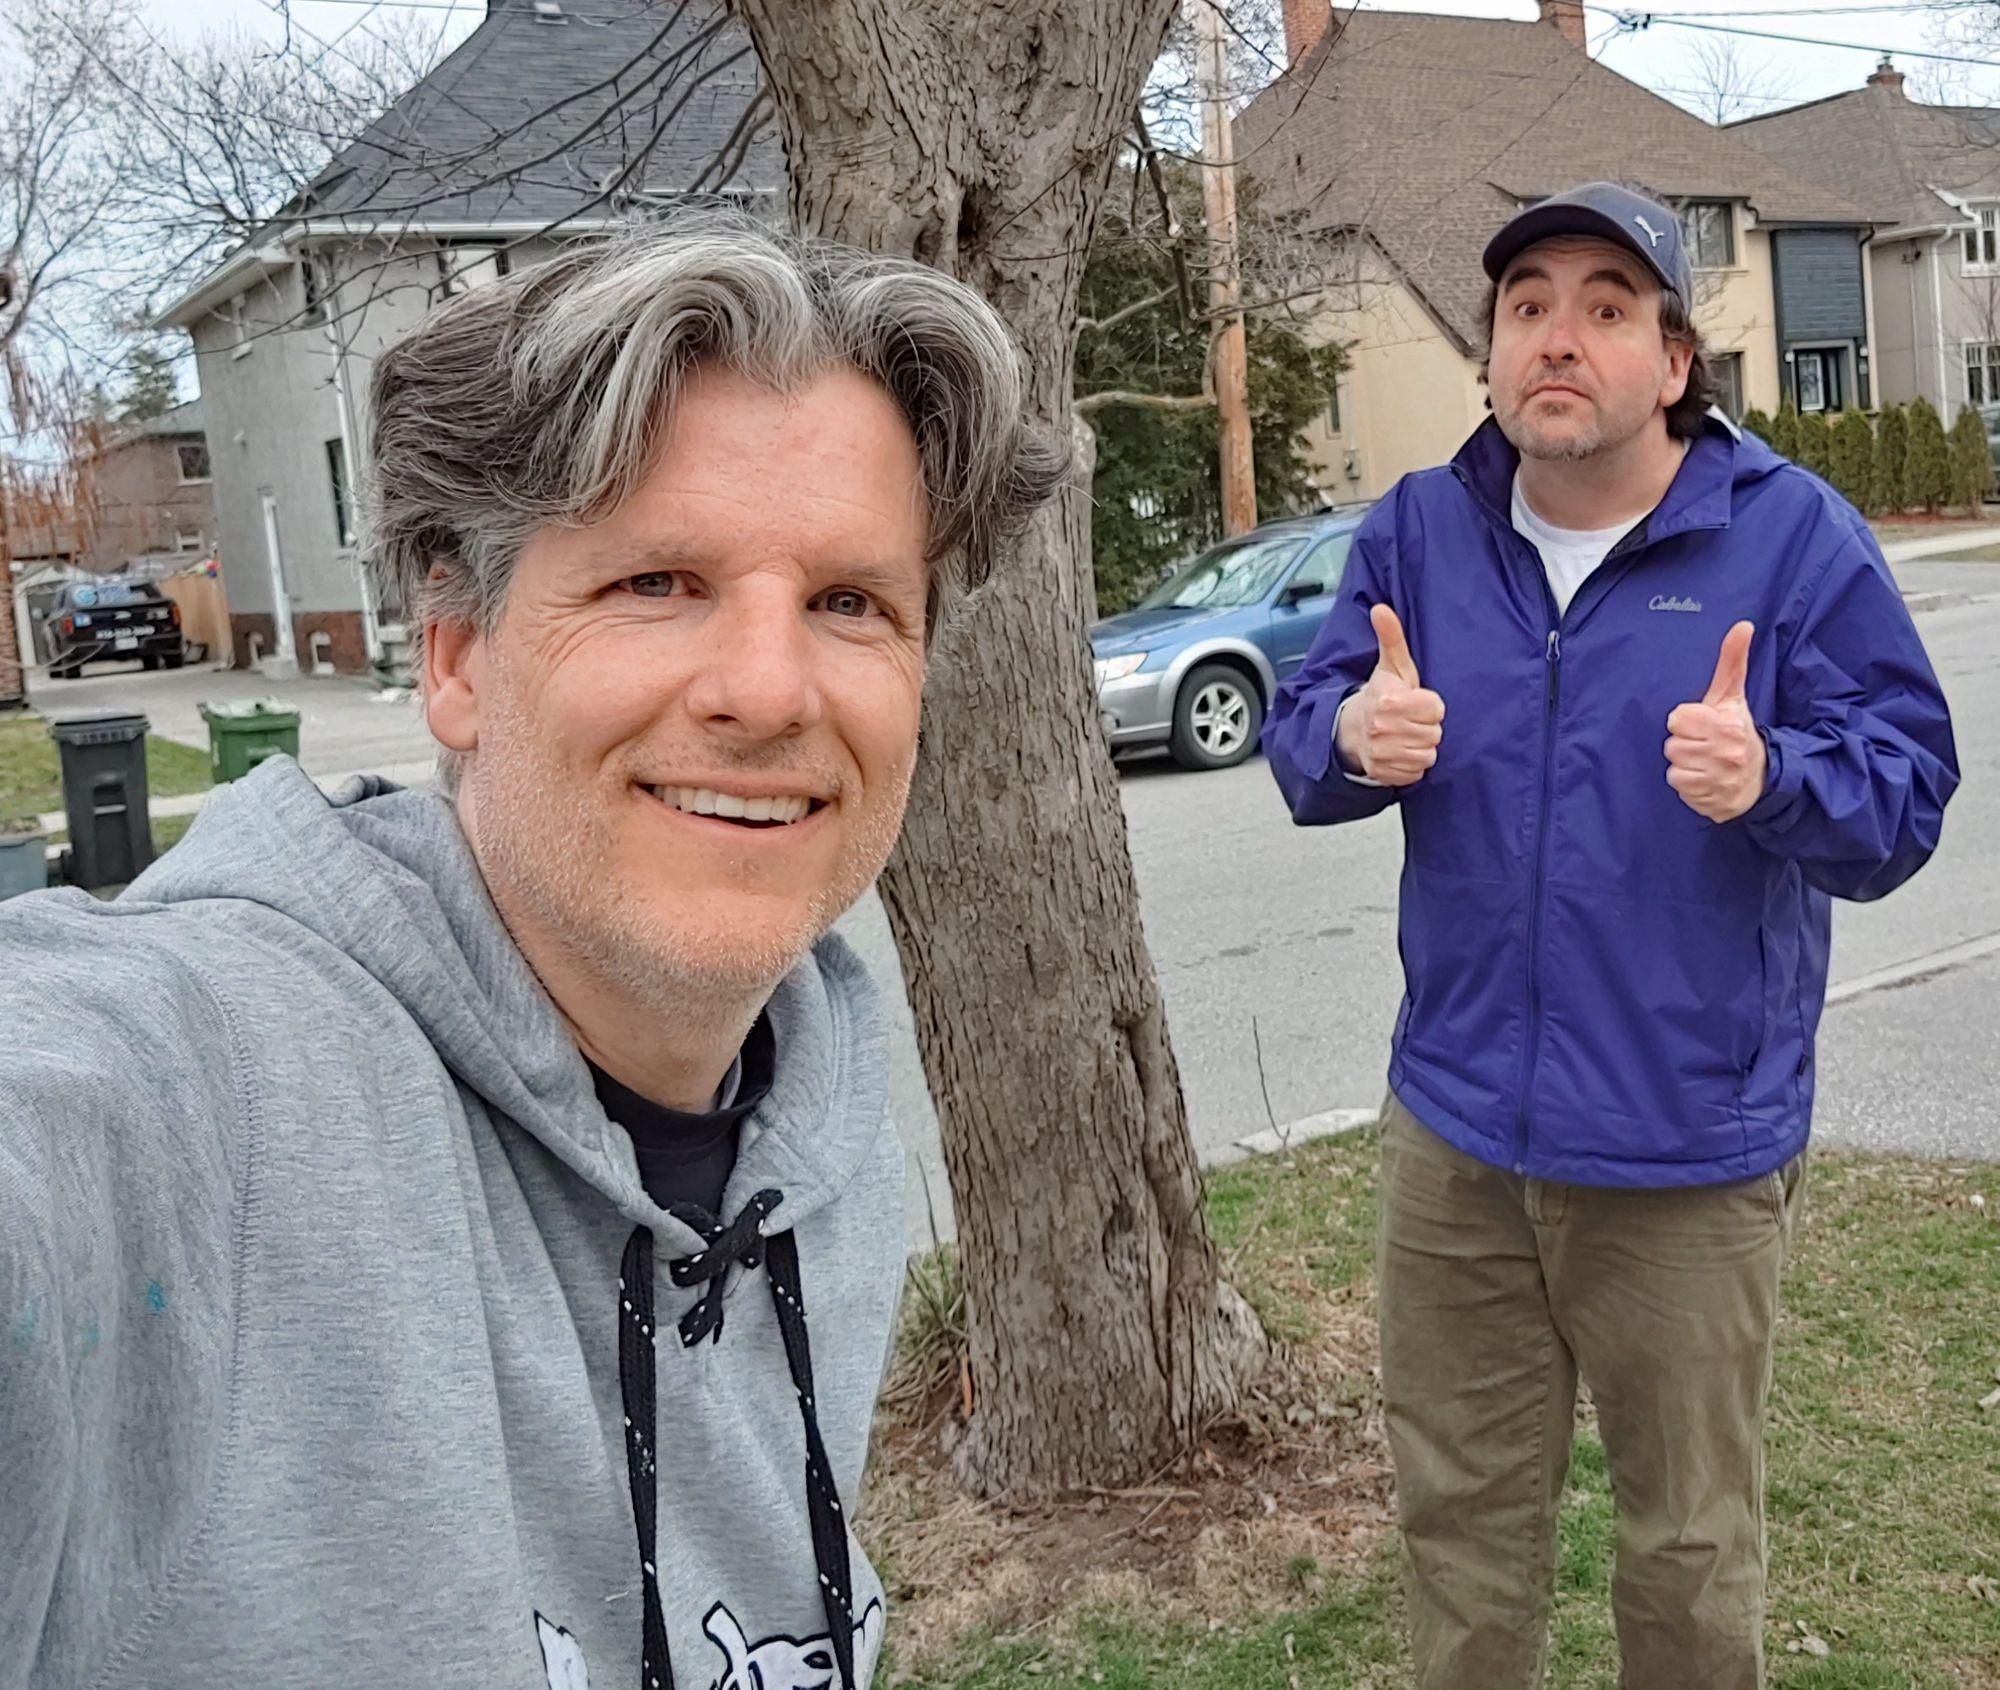 Toronto Mike'd Podcast Episode 831: Marc Weisblott from 12:36